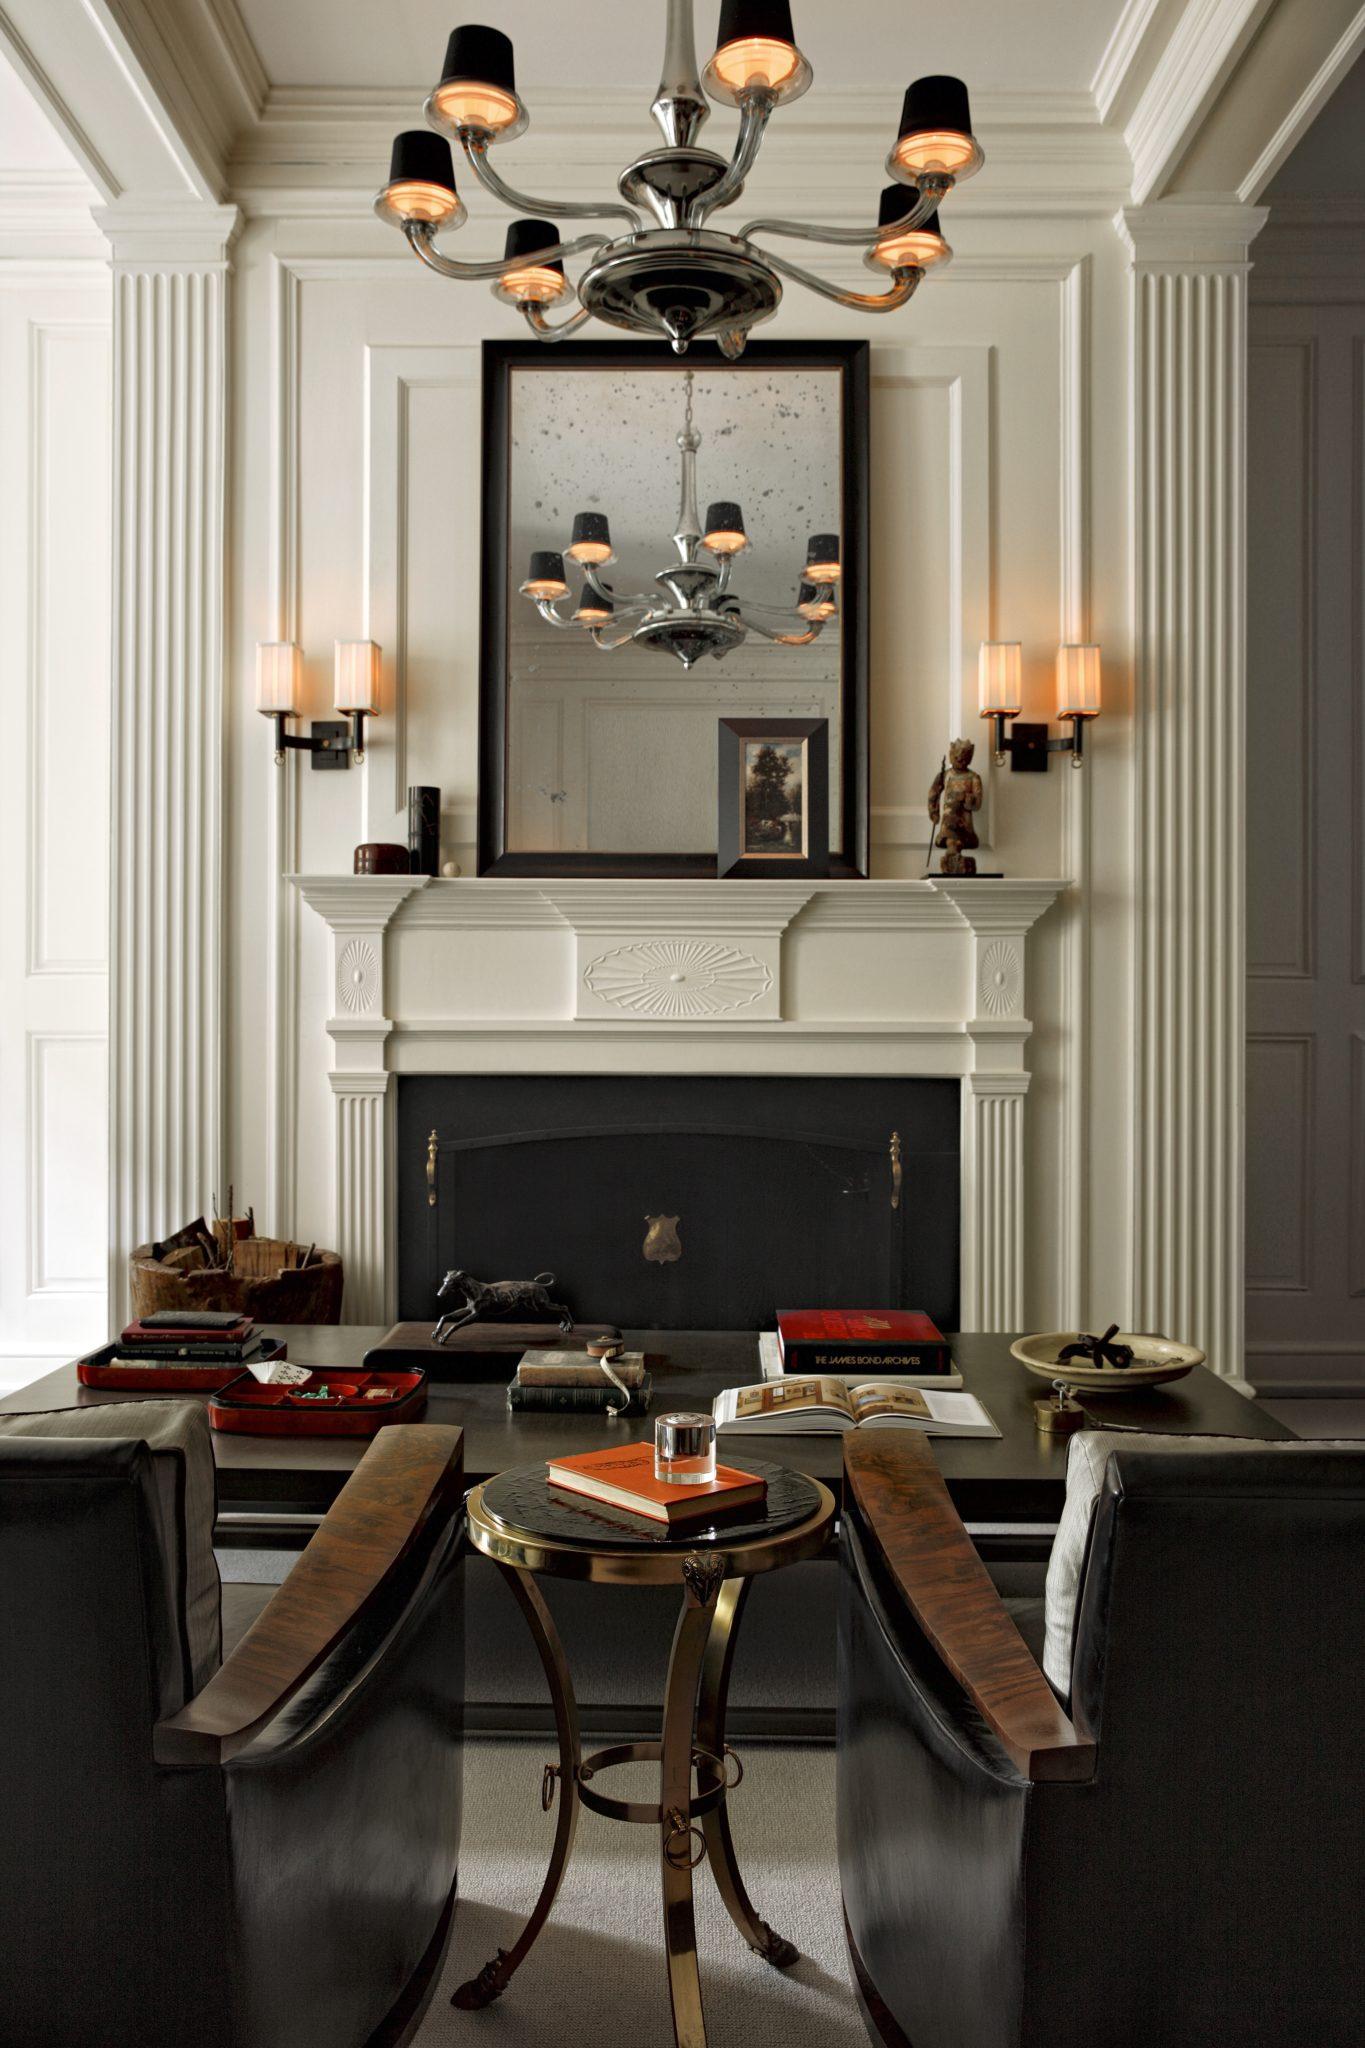 Delancey Street at Eighteenth, Living Room Fireplace Detail by Ashli Mizell